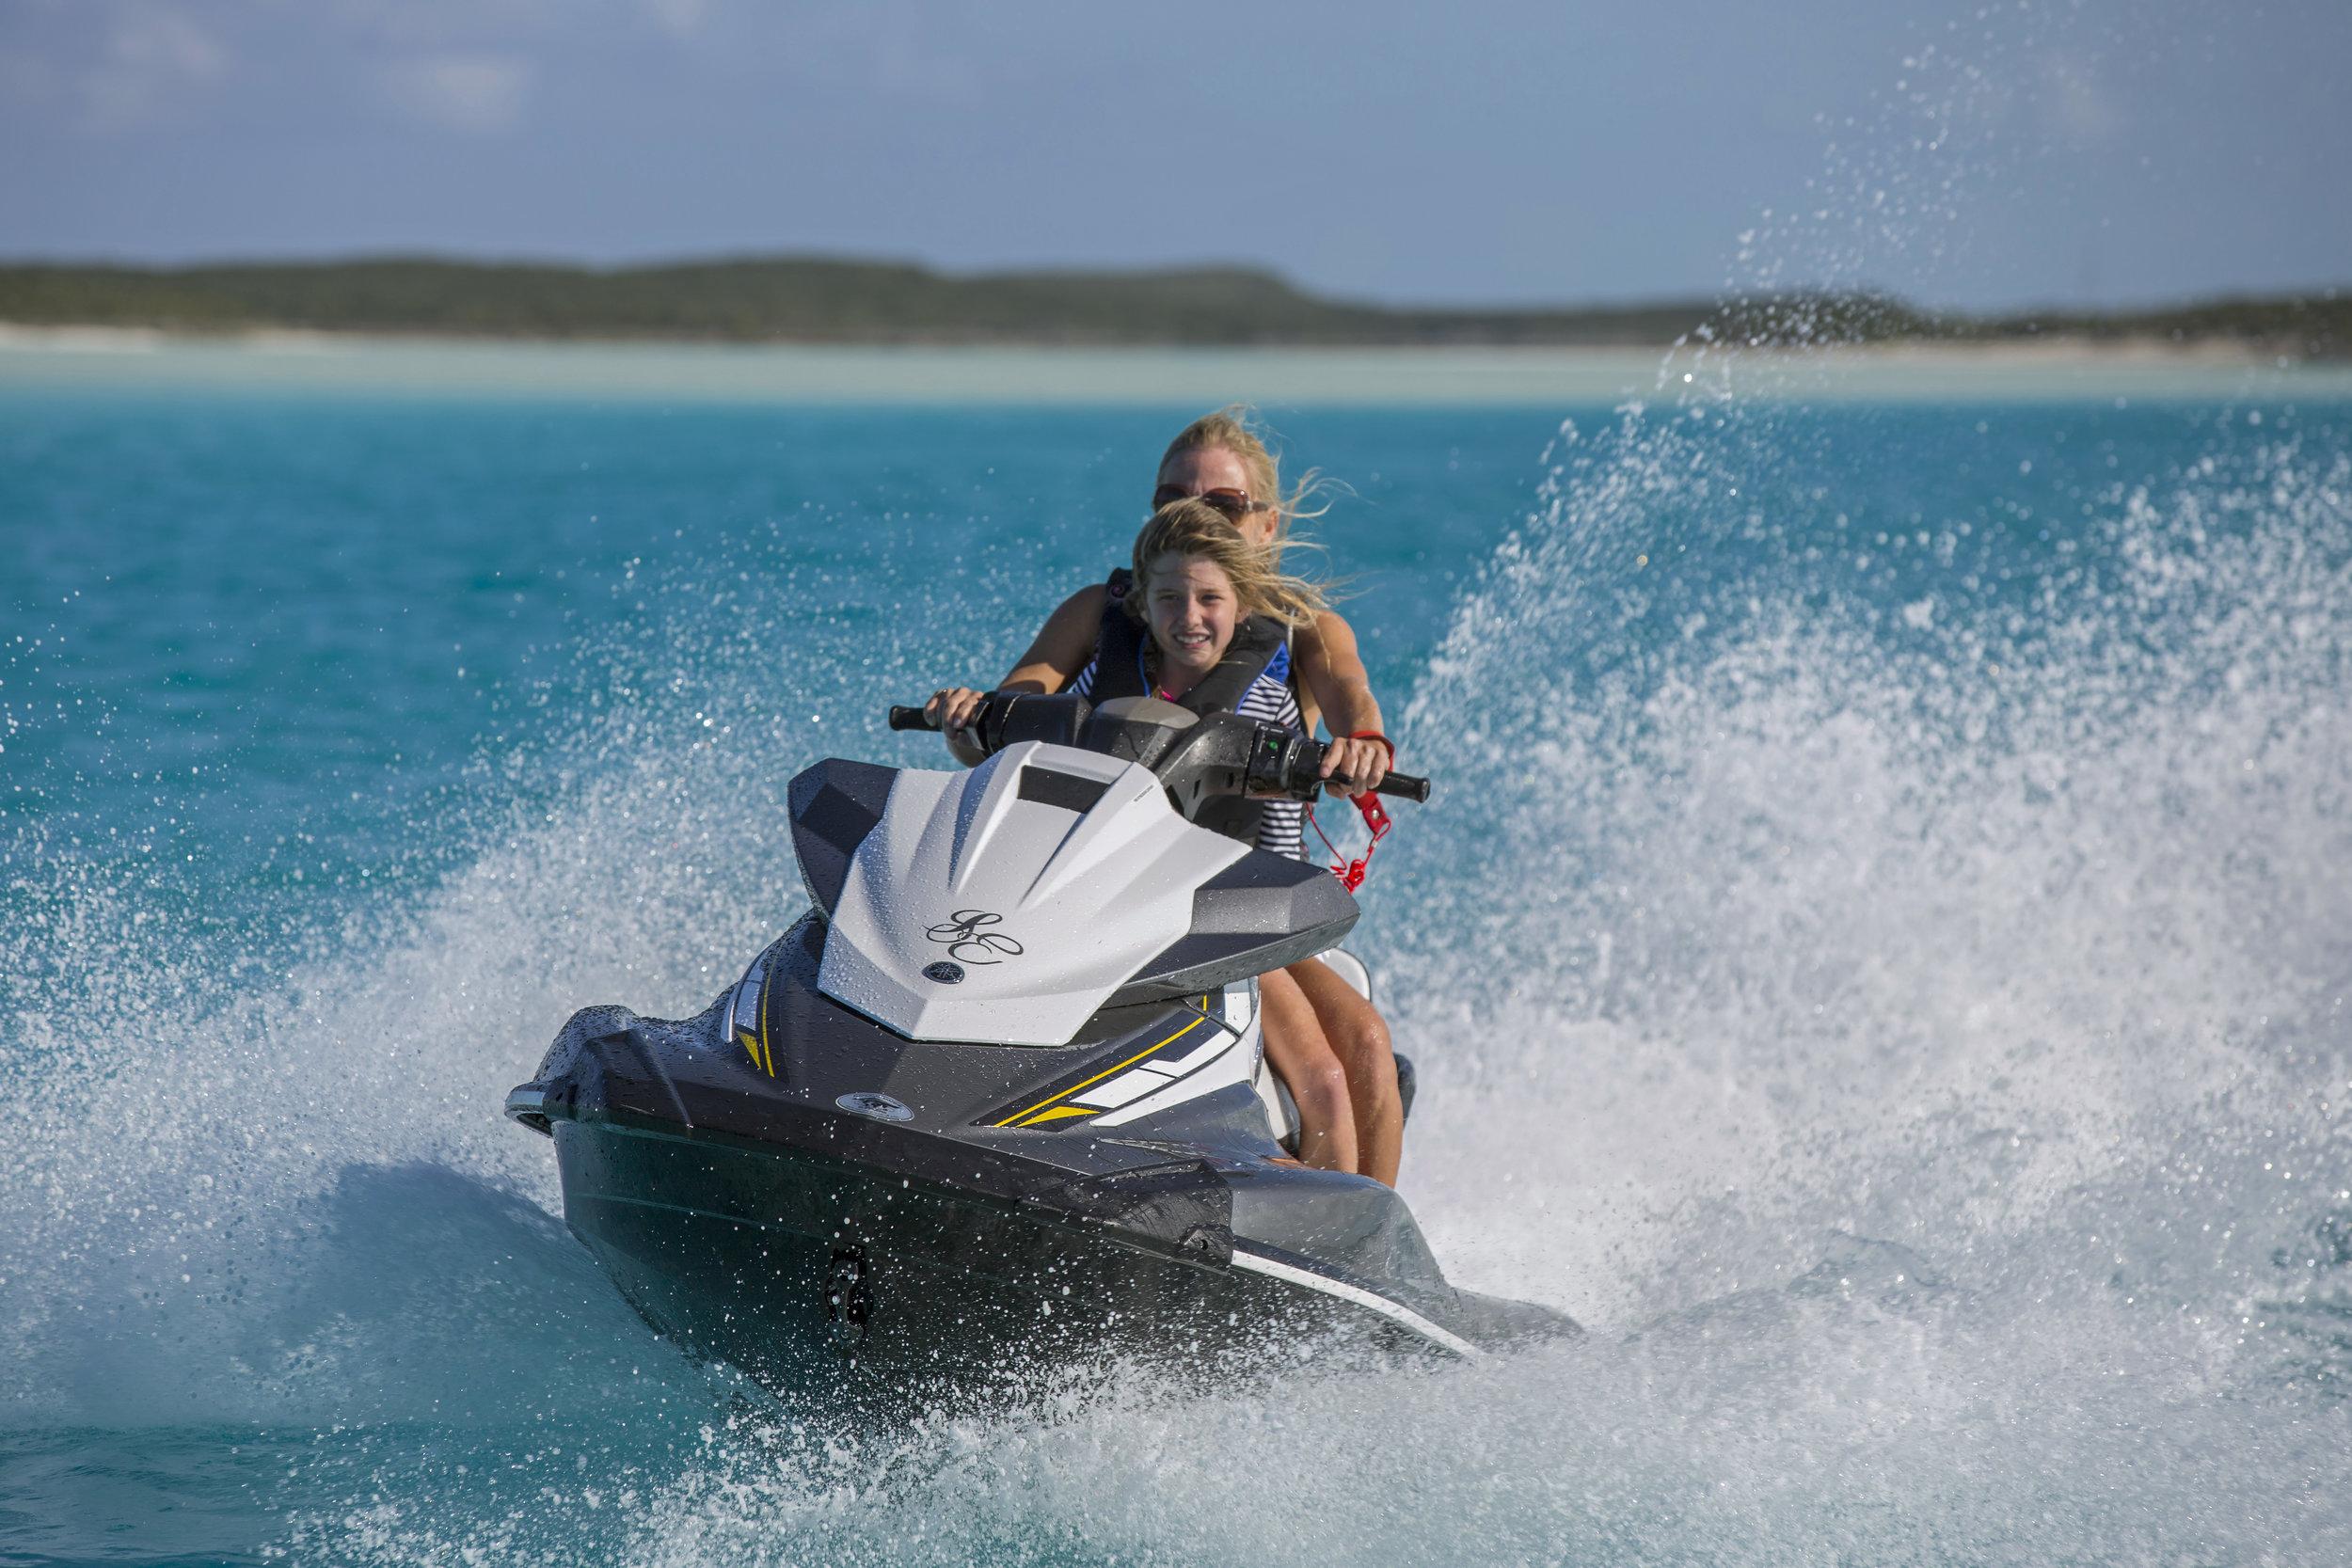 jason-decaires-taylor-Atlas-Yacht-sweet-escape-charter-dive-snorkle-activities-destinations-bahamas-luxury-eco-tourism-mdermaid-copperfield-rudder-cut-cay-exuma-jetski-jet-ski